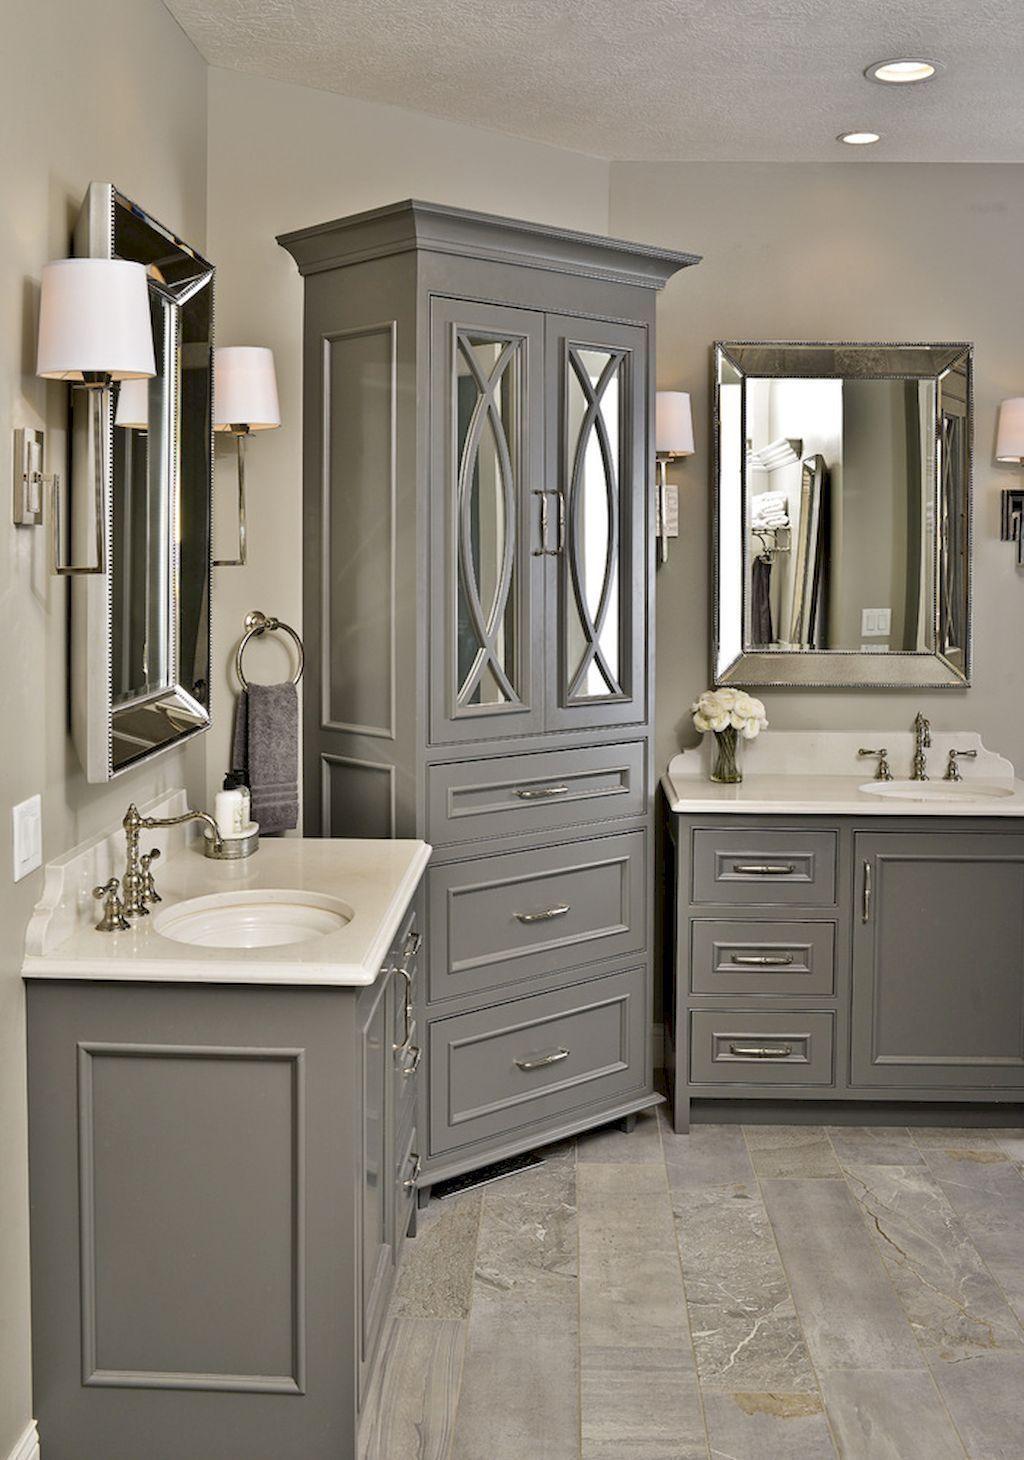 20+ Amazing Bathroom Remodel Ideas #smallbathroomremodel ...